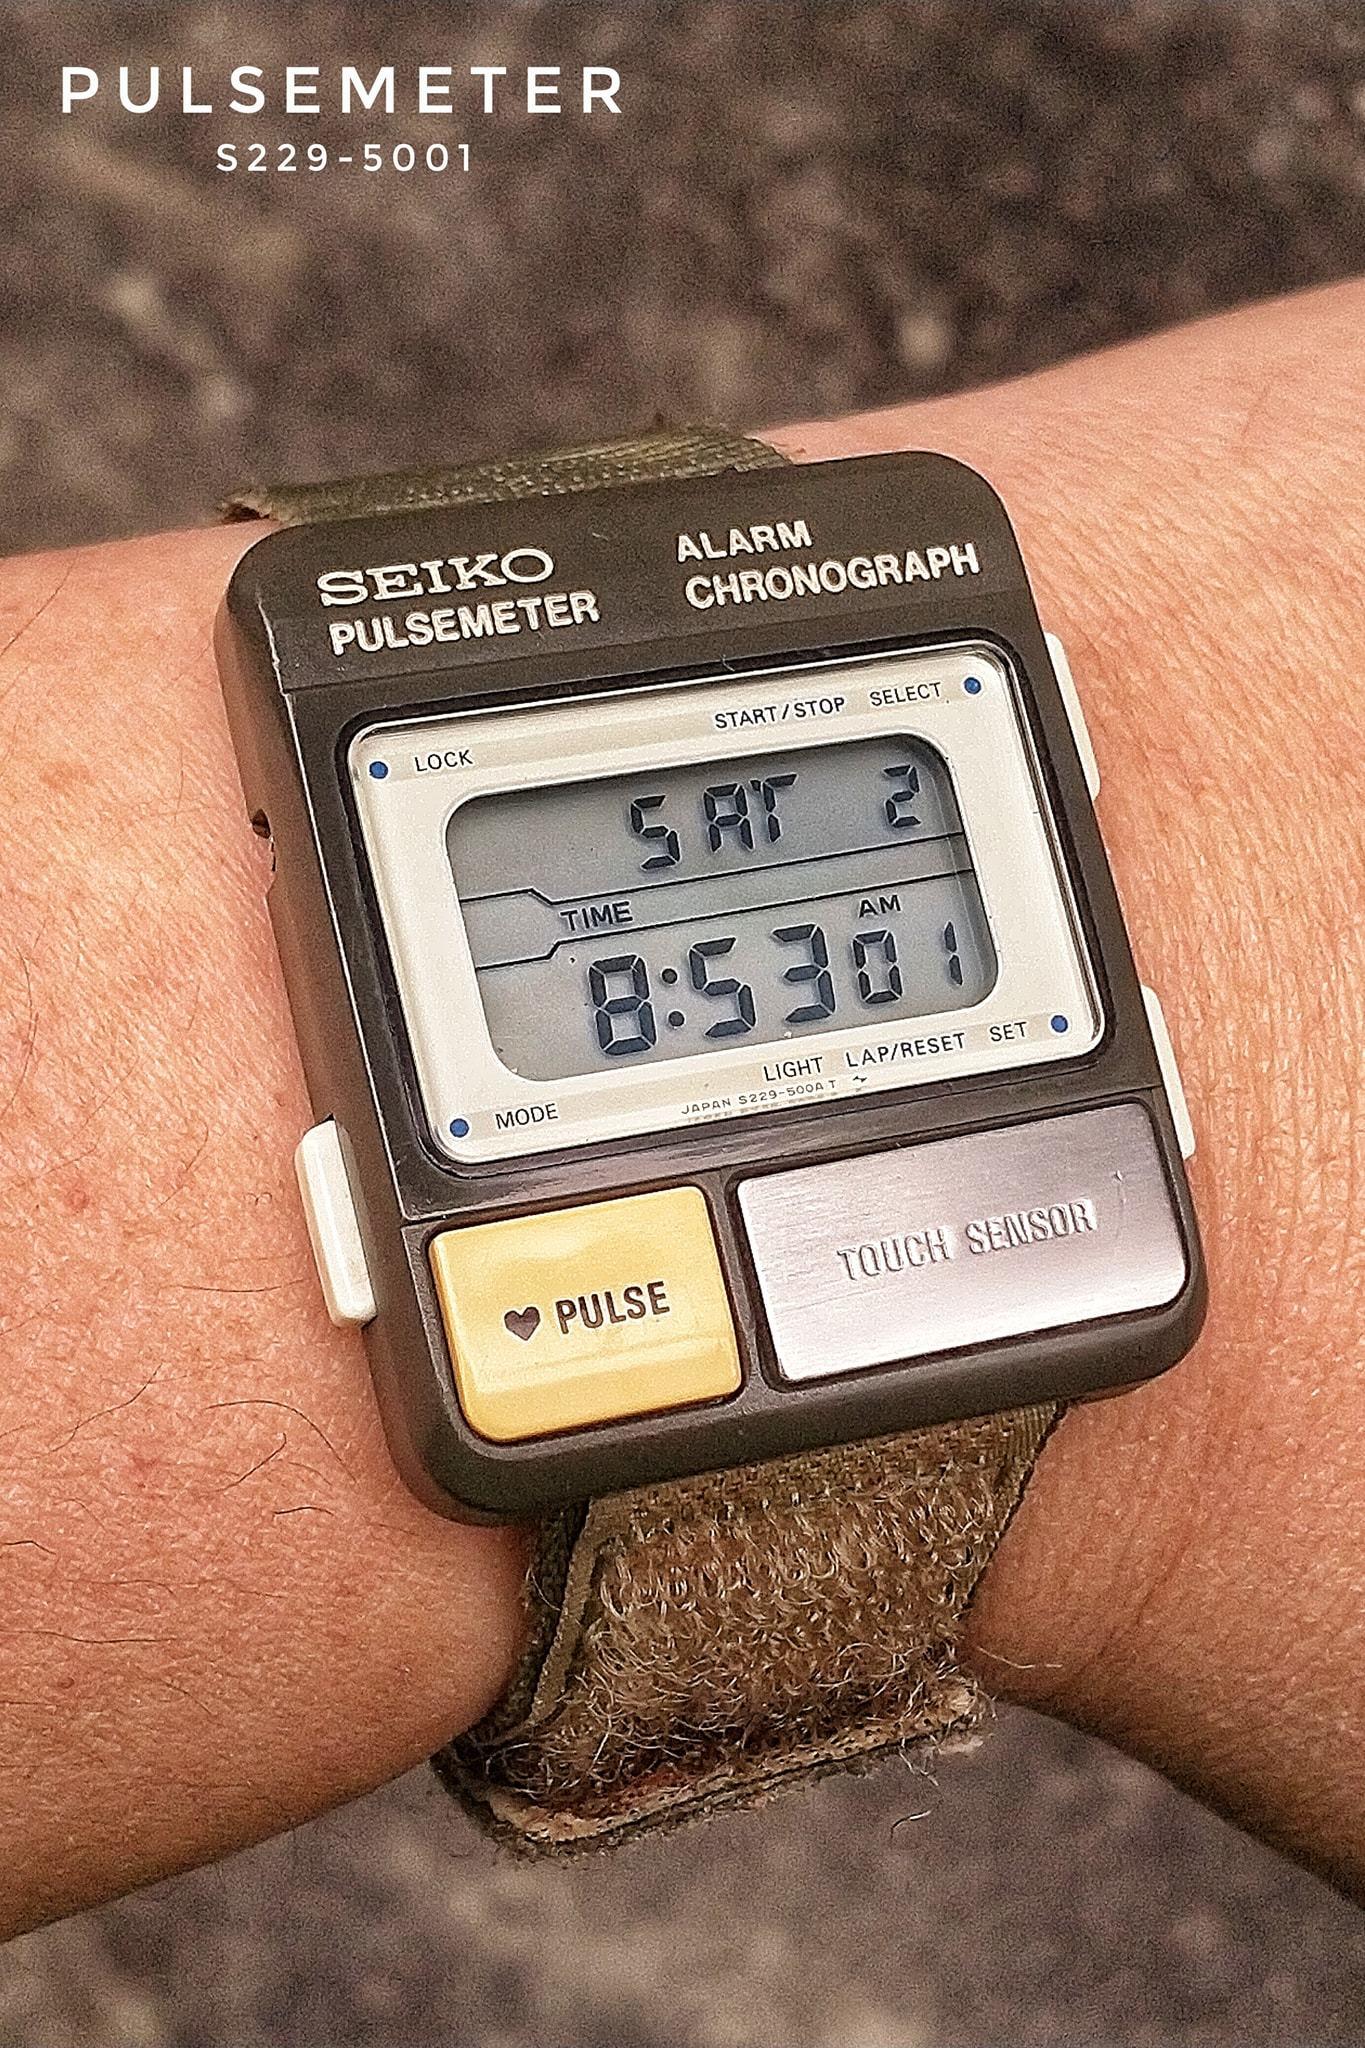 Seiko Pulsemeter S229-5001